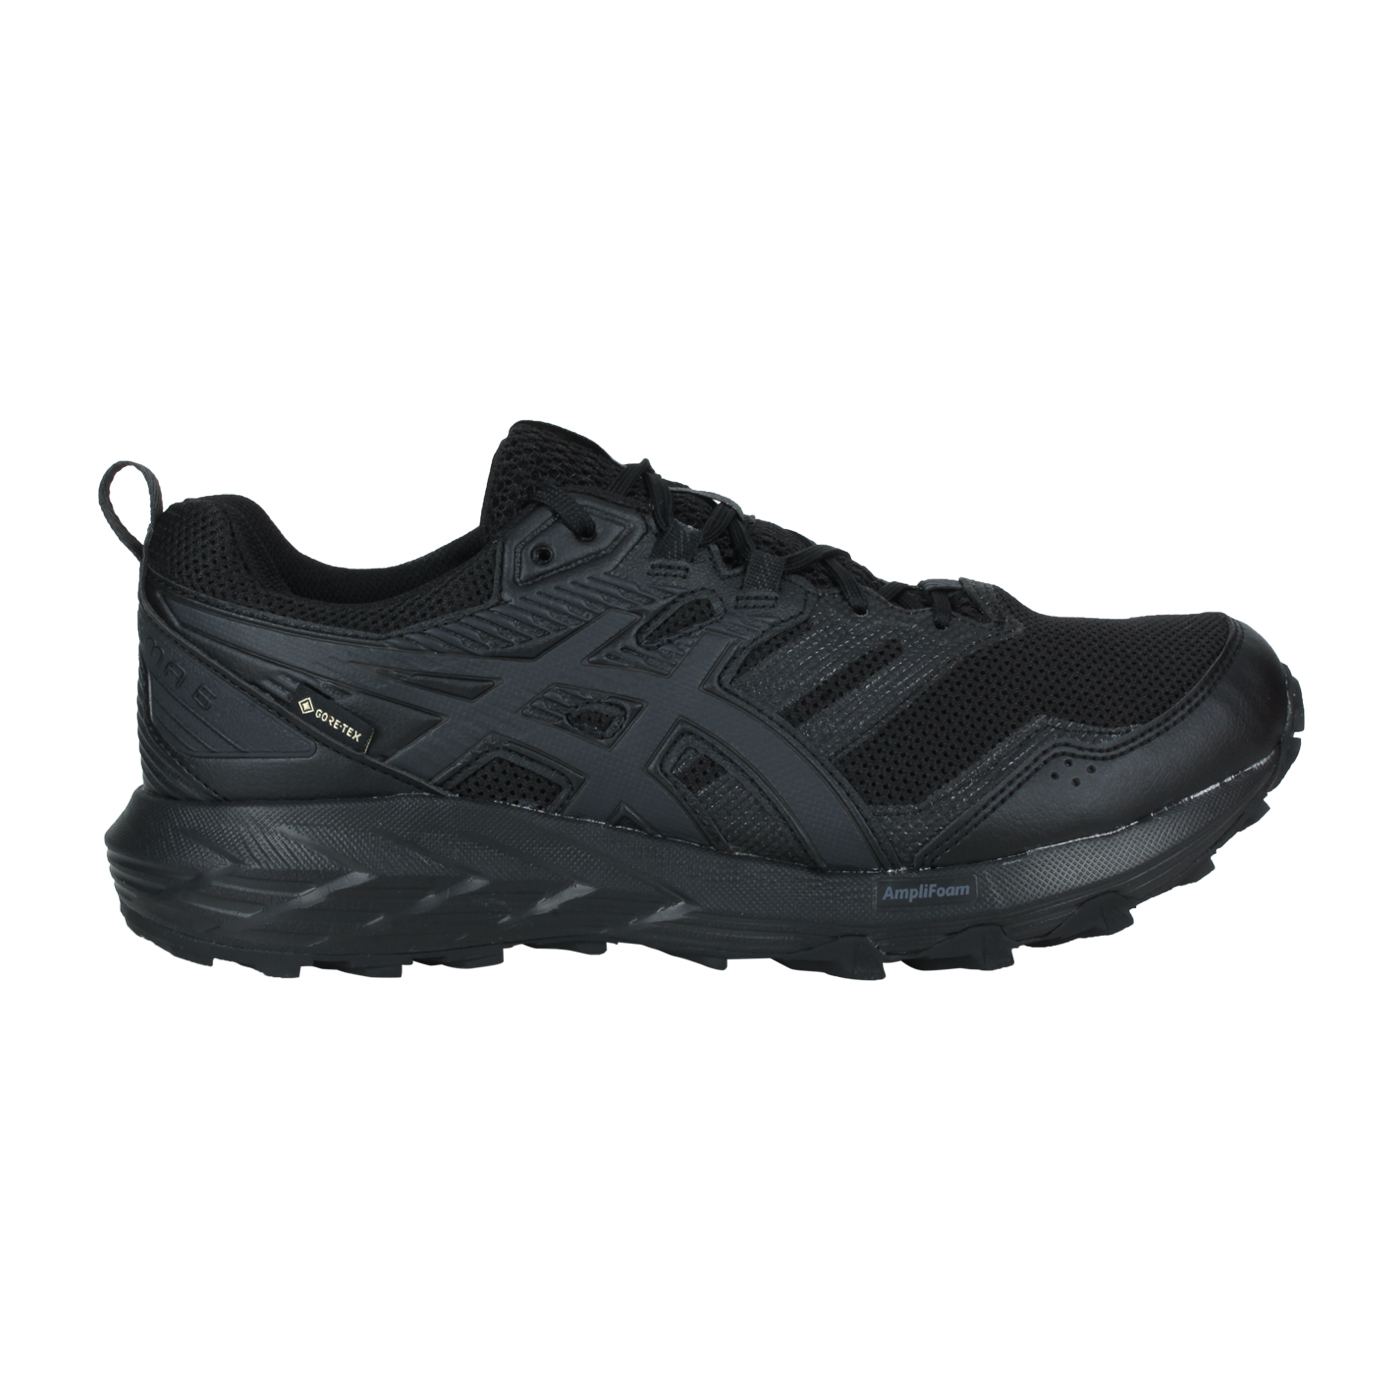 ASICS 男款慢跑鞋  @GEL-SONOMA 6 G-TX@1011B048-002